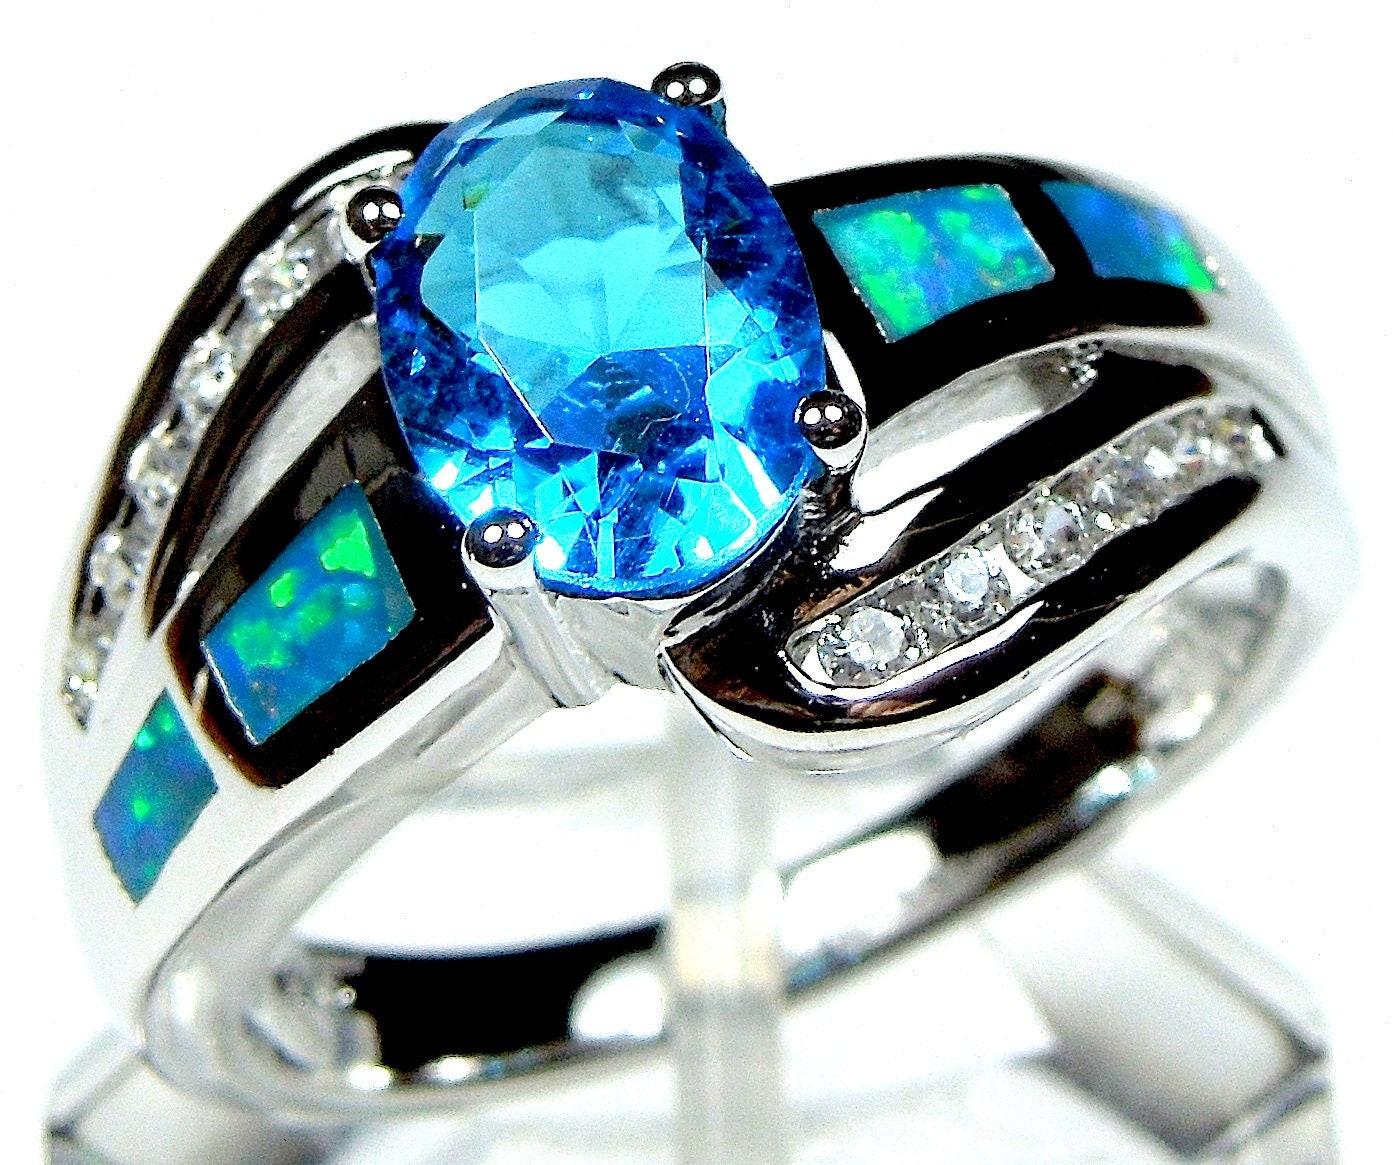 Stunning 925 Sterling Silver Fire Opal /& White Topaz Bangle Bracelet 19cm